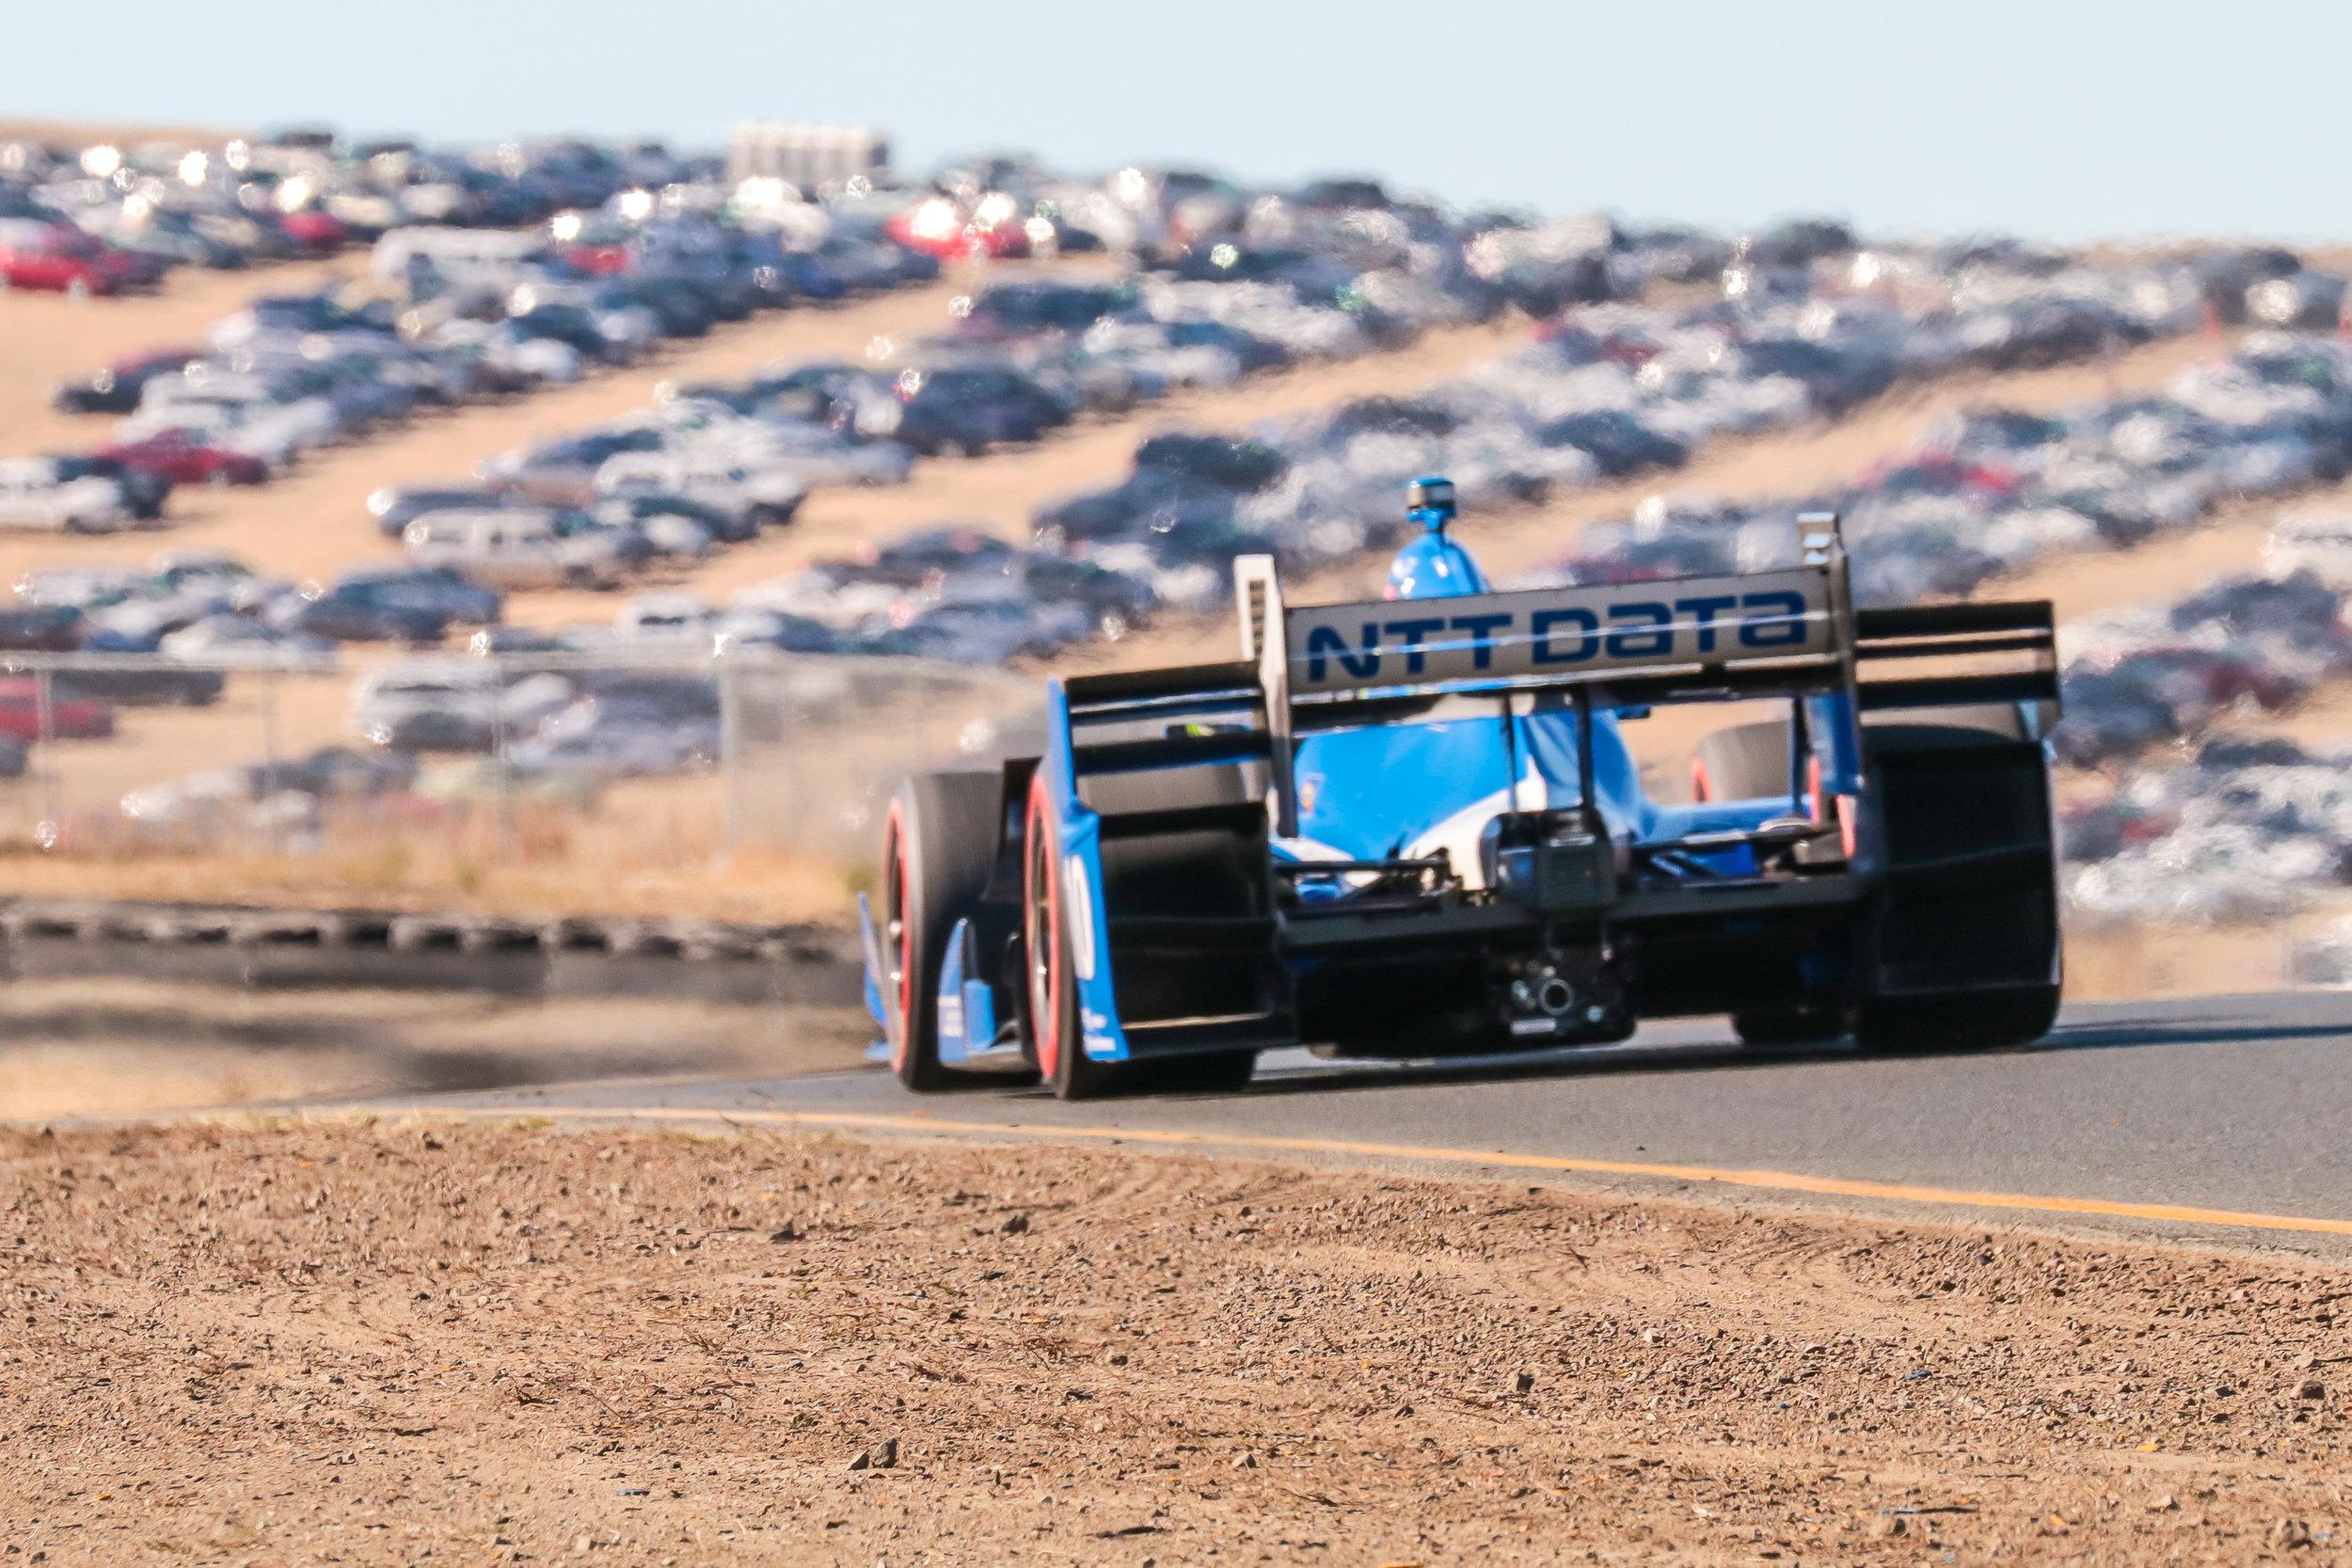 Indy16-3210.jpg